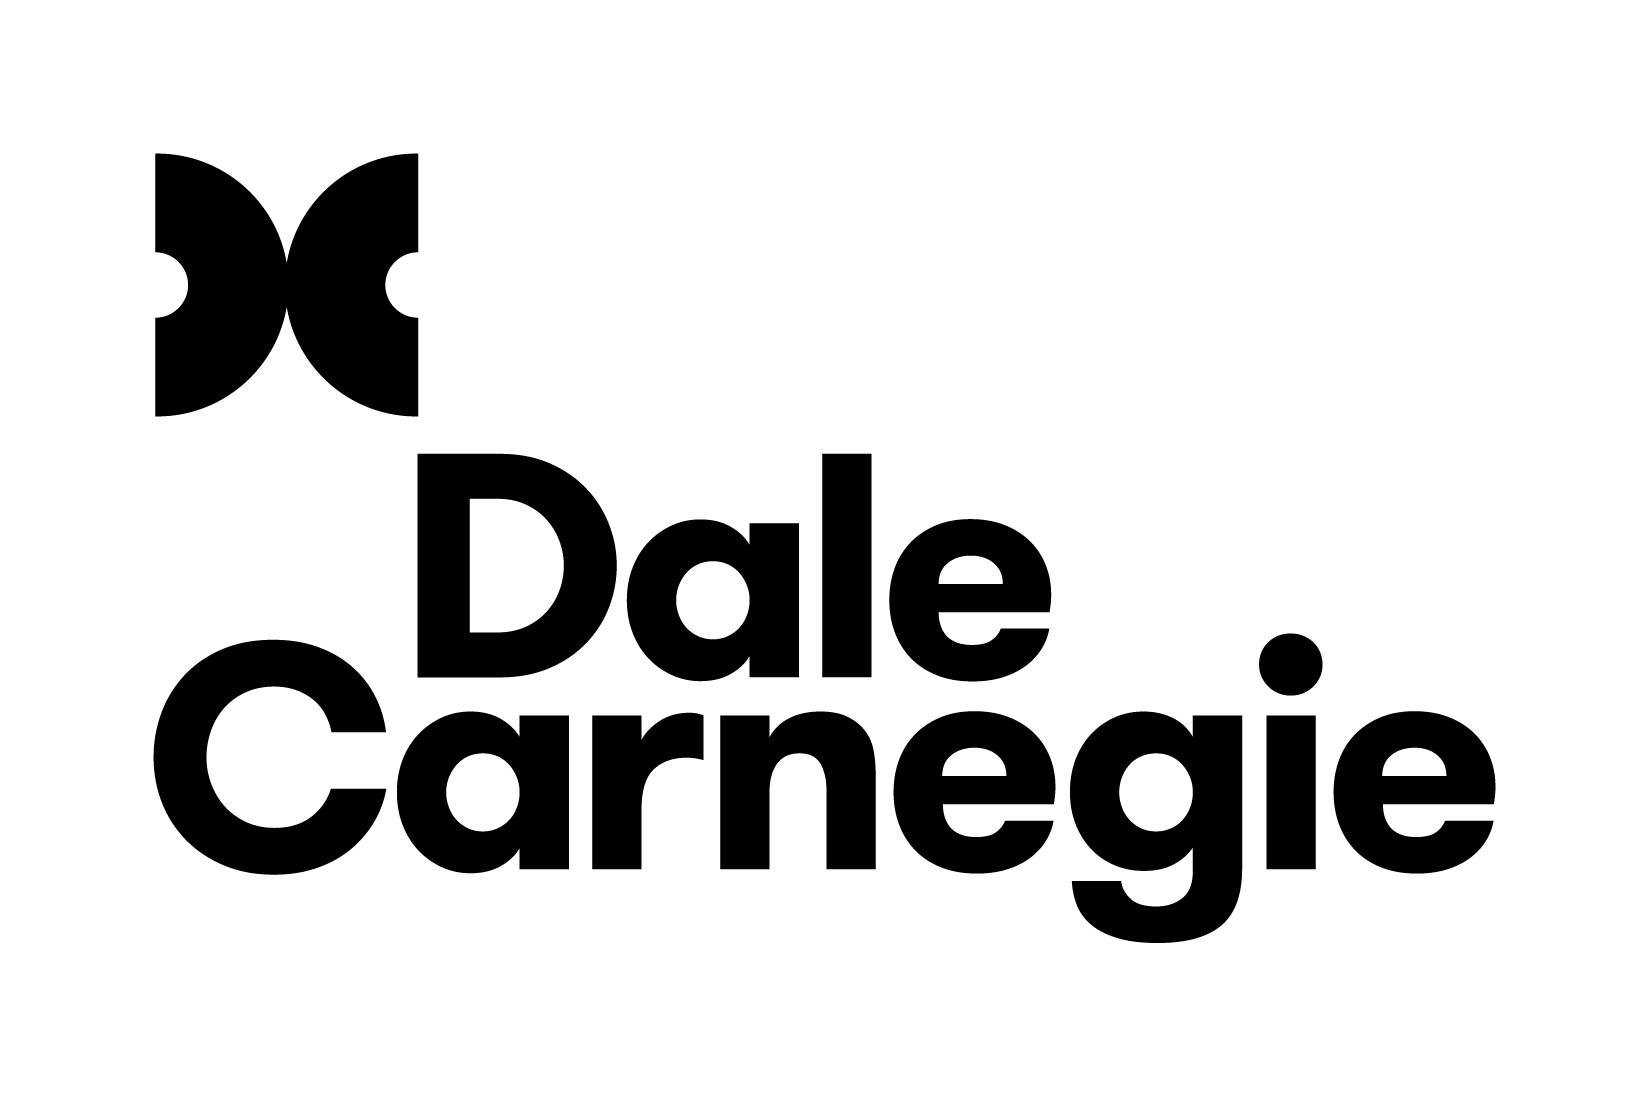 Dale_Carnegie_stacked_lock-up_logo.jpg